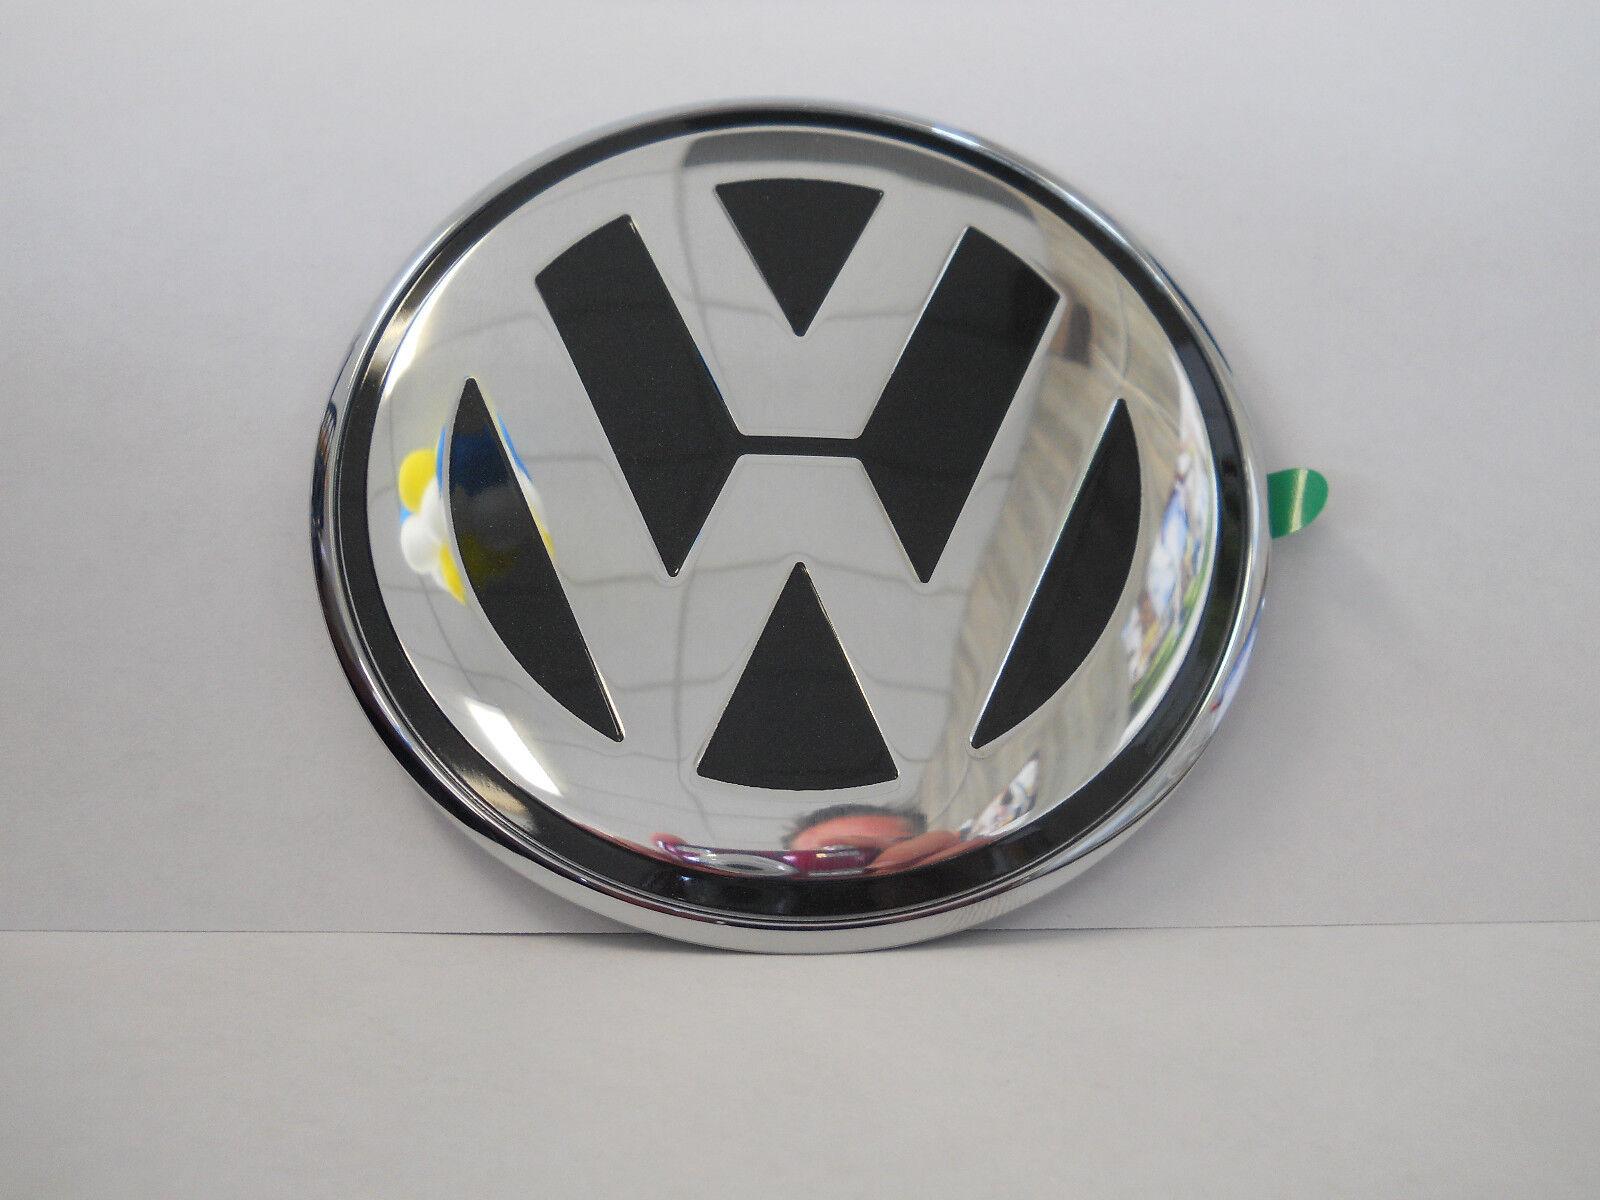 Vw New Beetle Volkswagen Hood Emblem 1998 1999 2000 2001